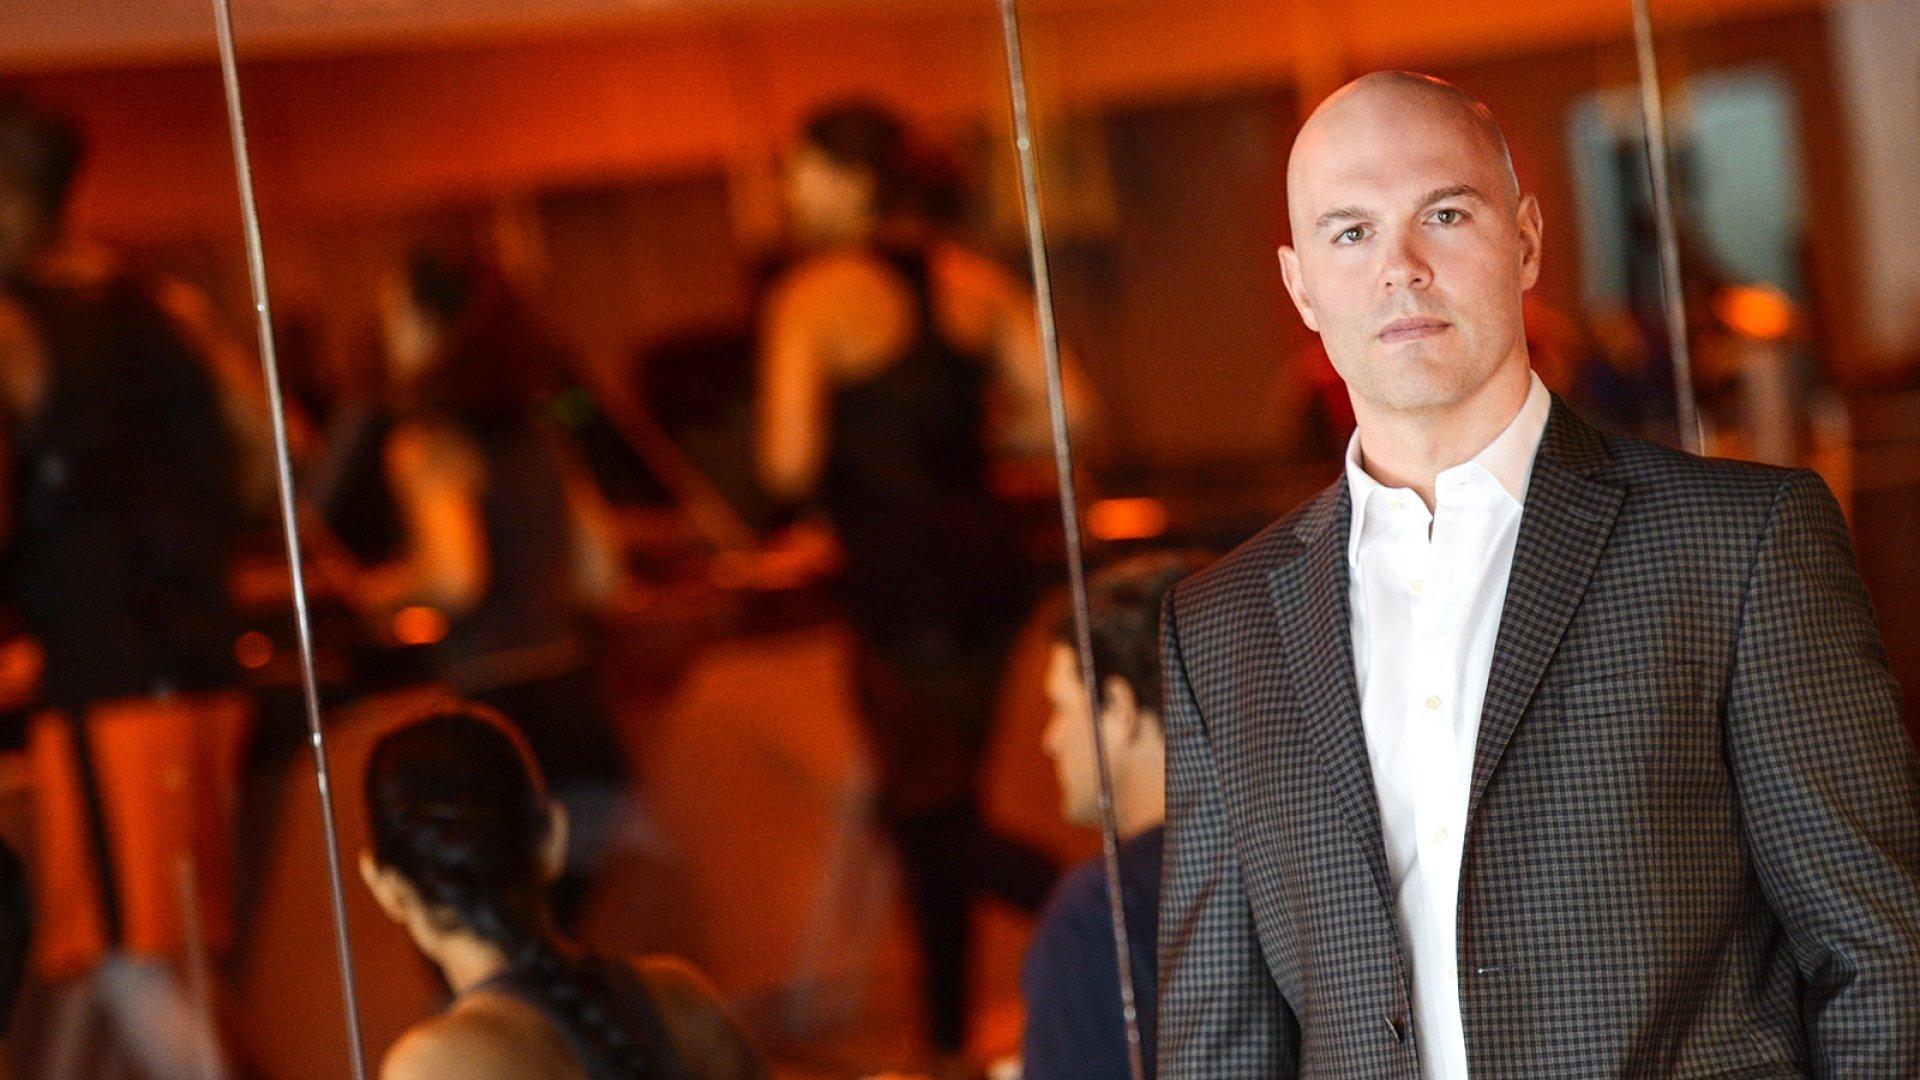 Dave Long, CEO of Orangetheory Fitness.